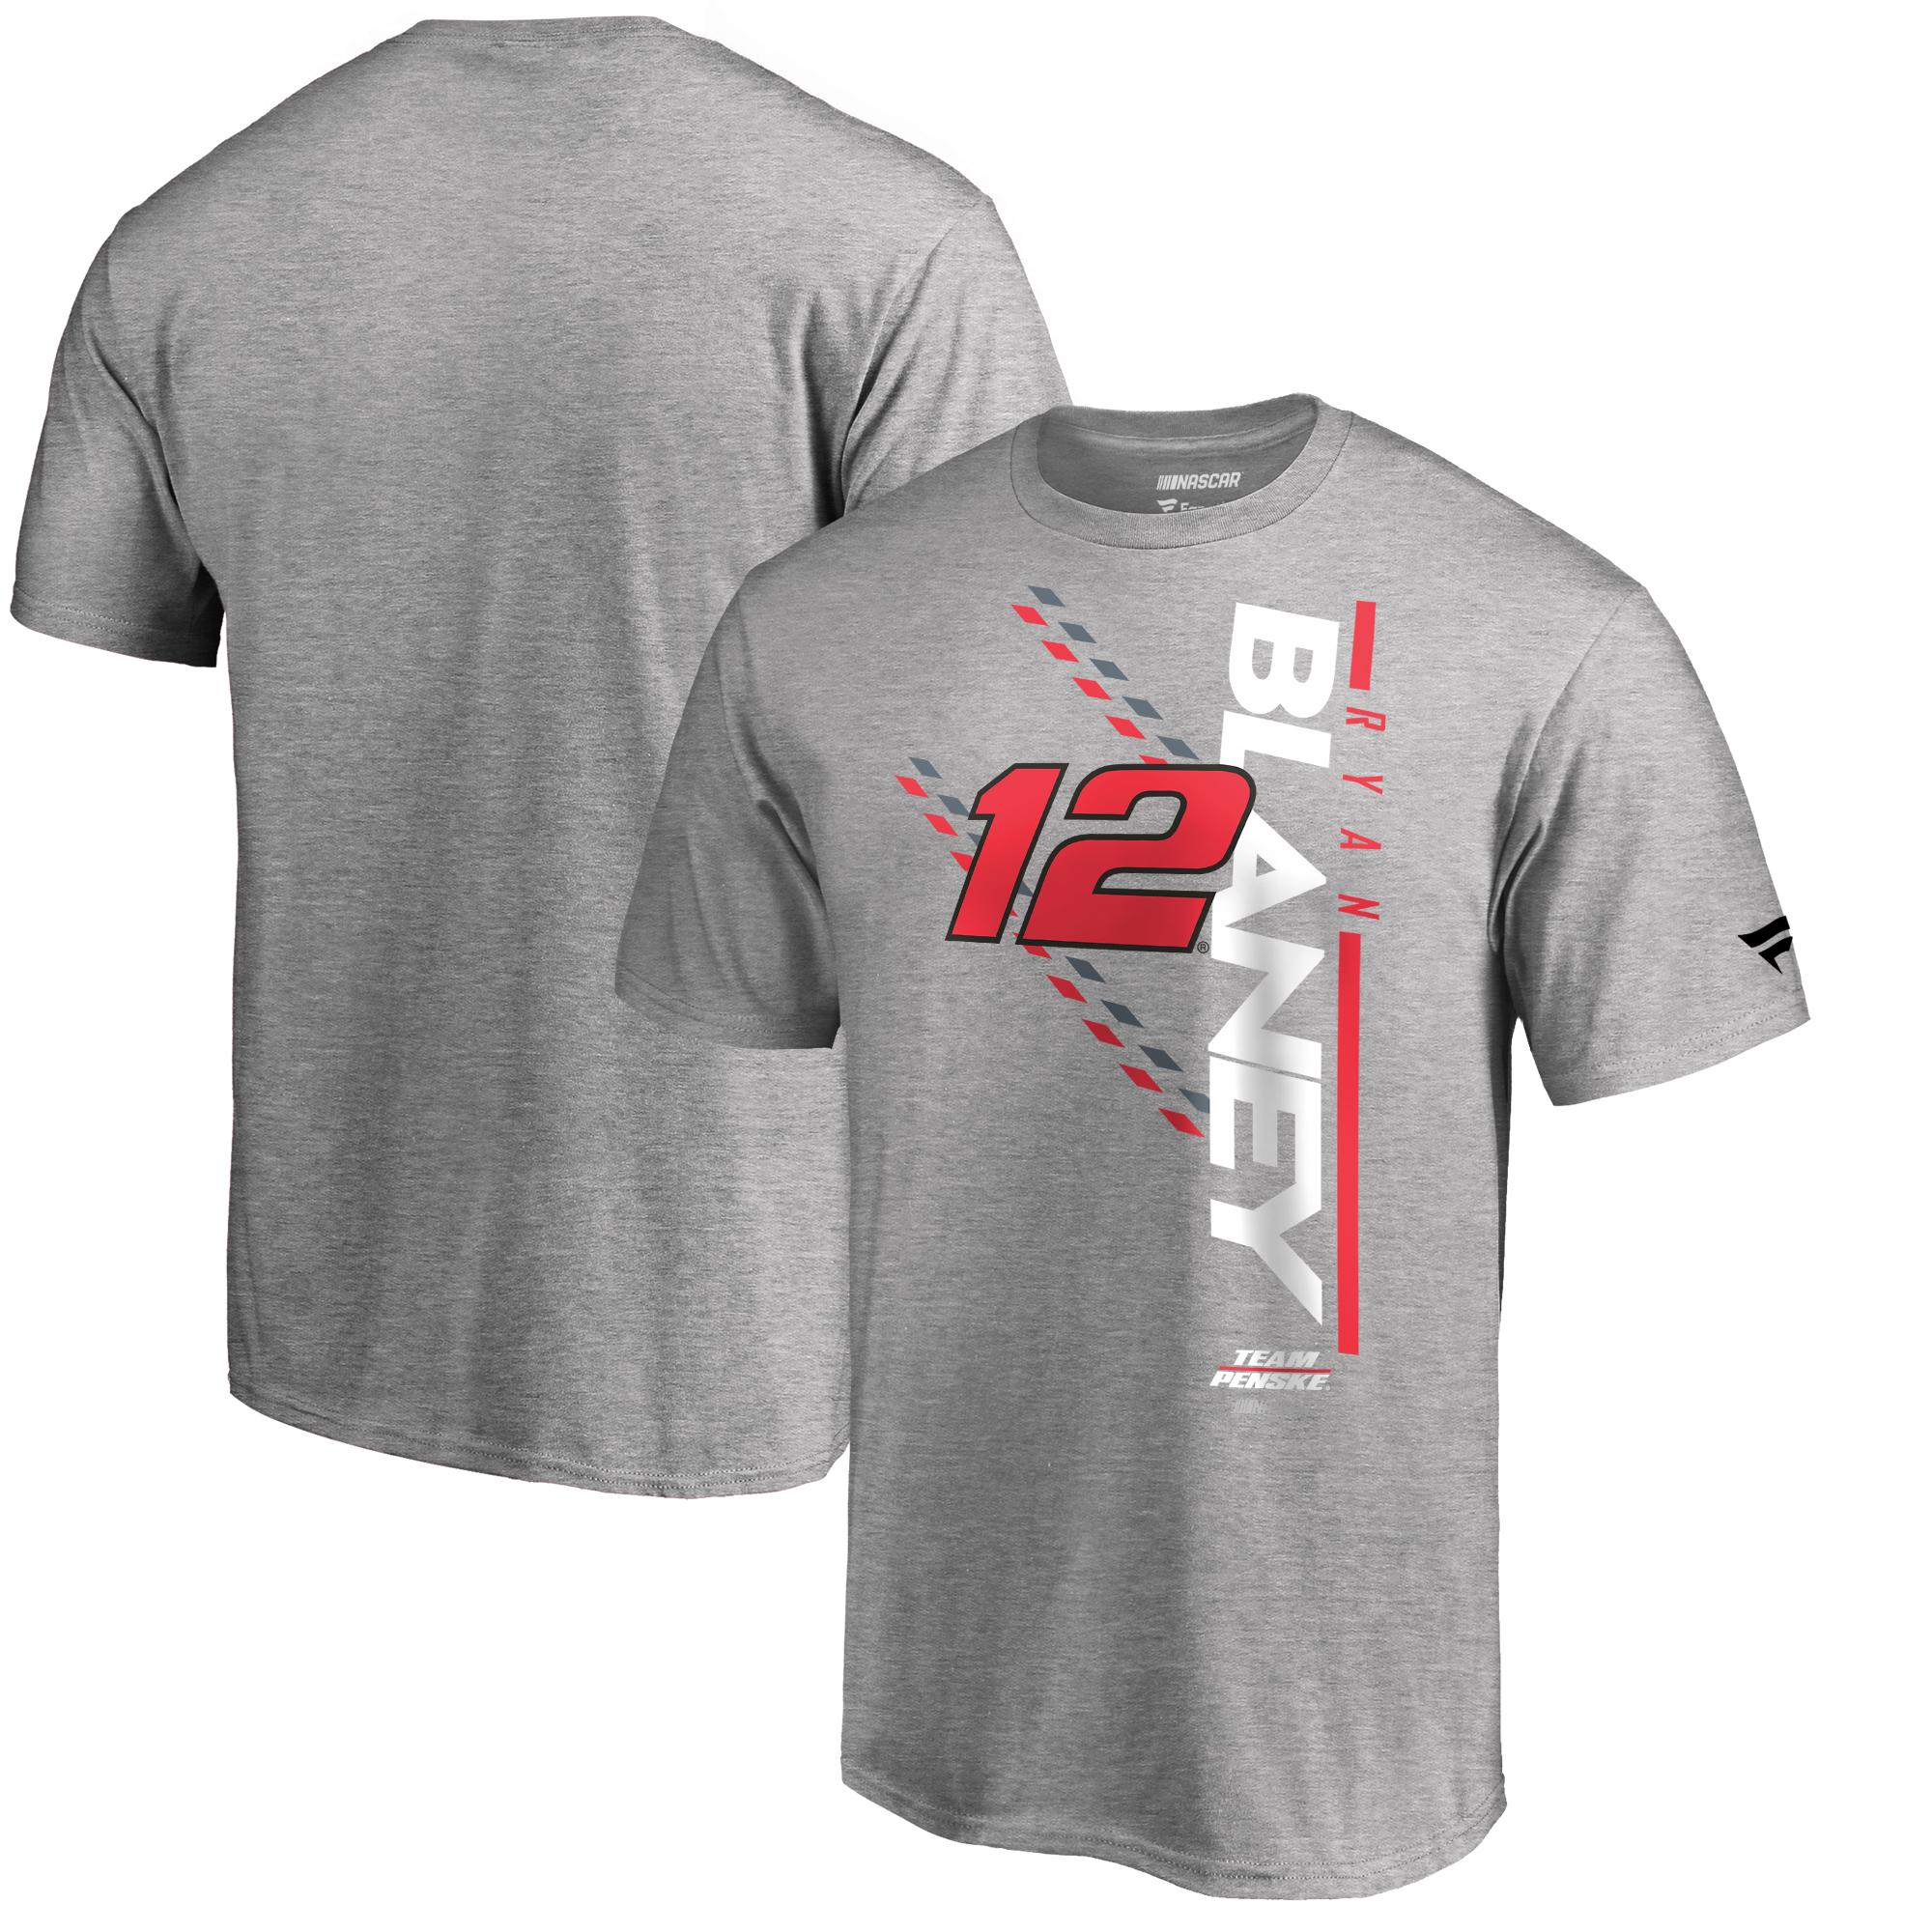 Ryan Blaney Fanatics Branded NASCAR Track Bar T-Shirt - Heather Gray